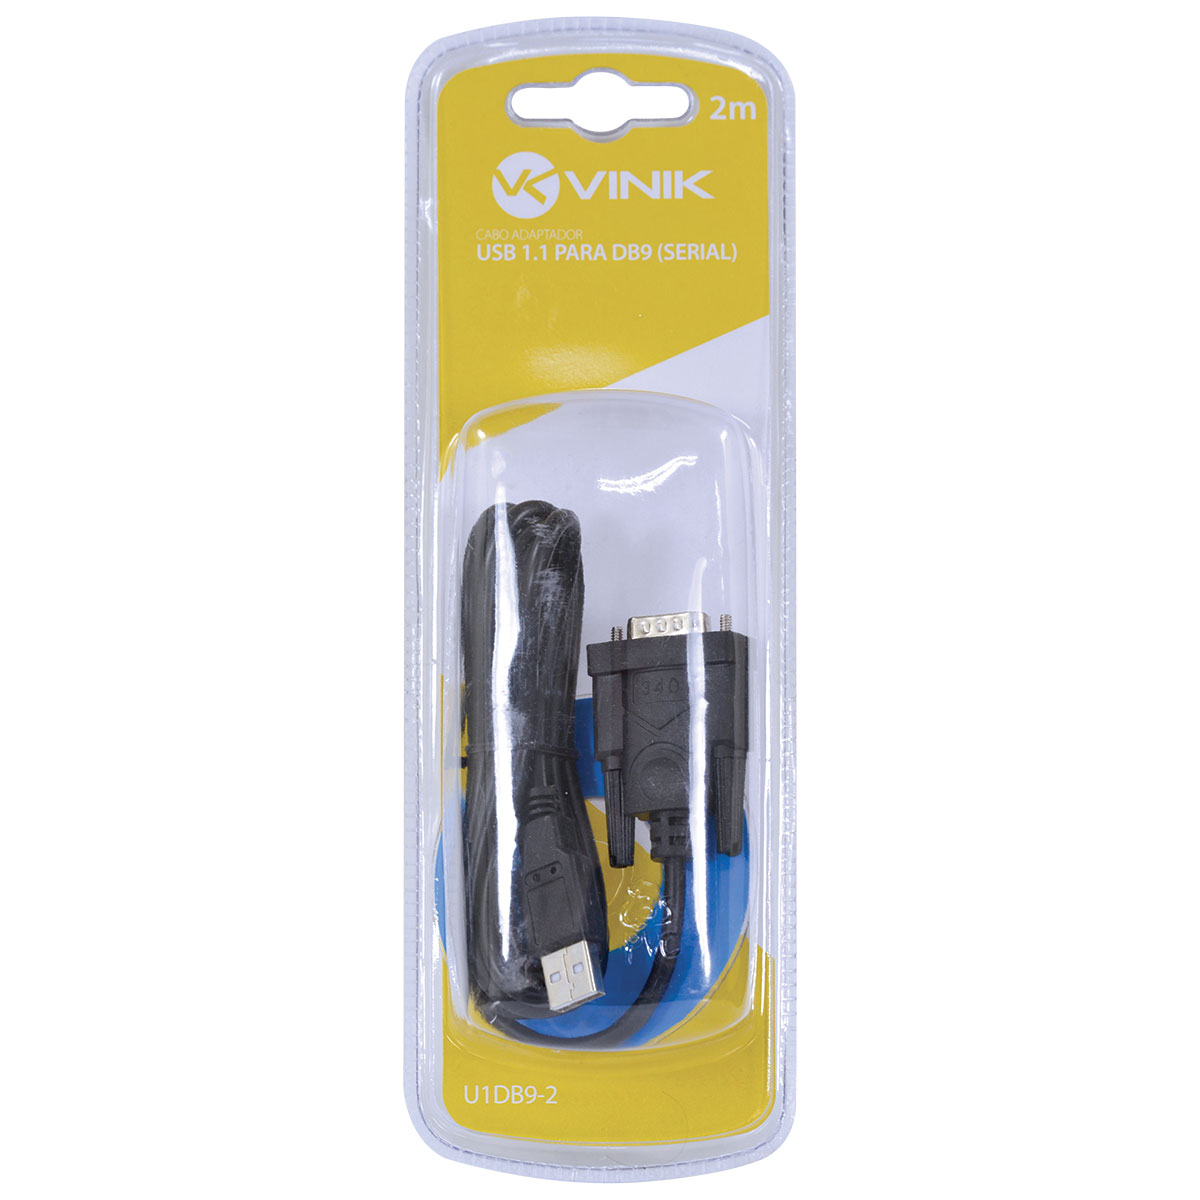 CABO USB 1.1 CONVERTE 1 PORTA USB EM 1 SAÍDA SERIAL DB9 RS232 2 METROS U1DB9-2